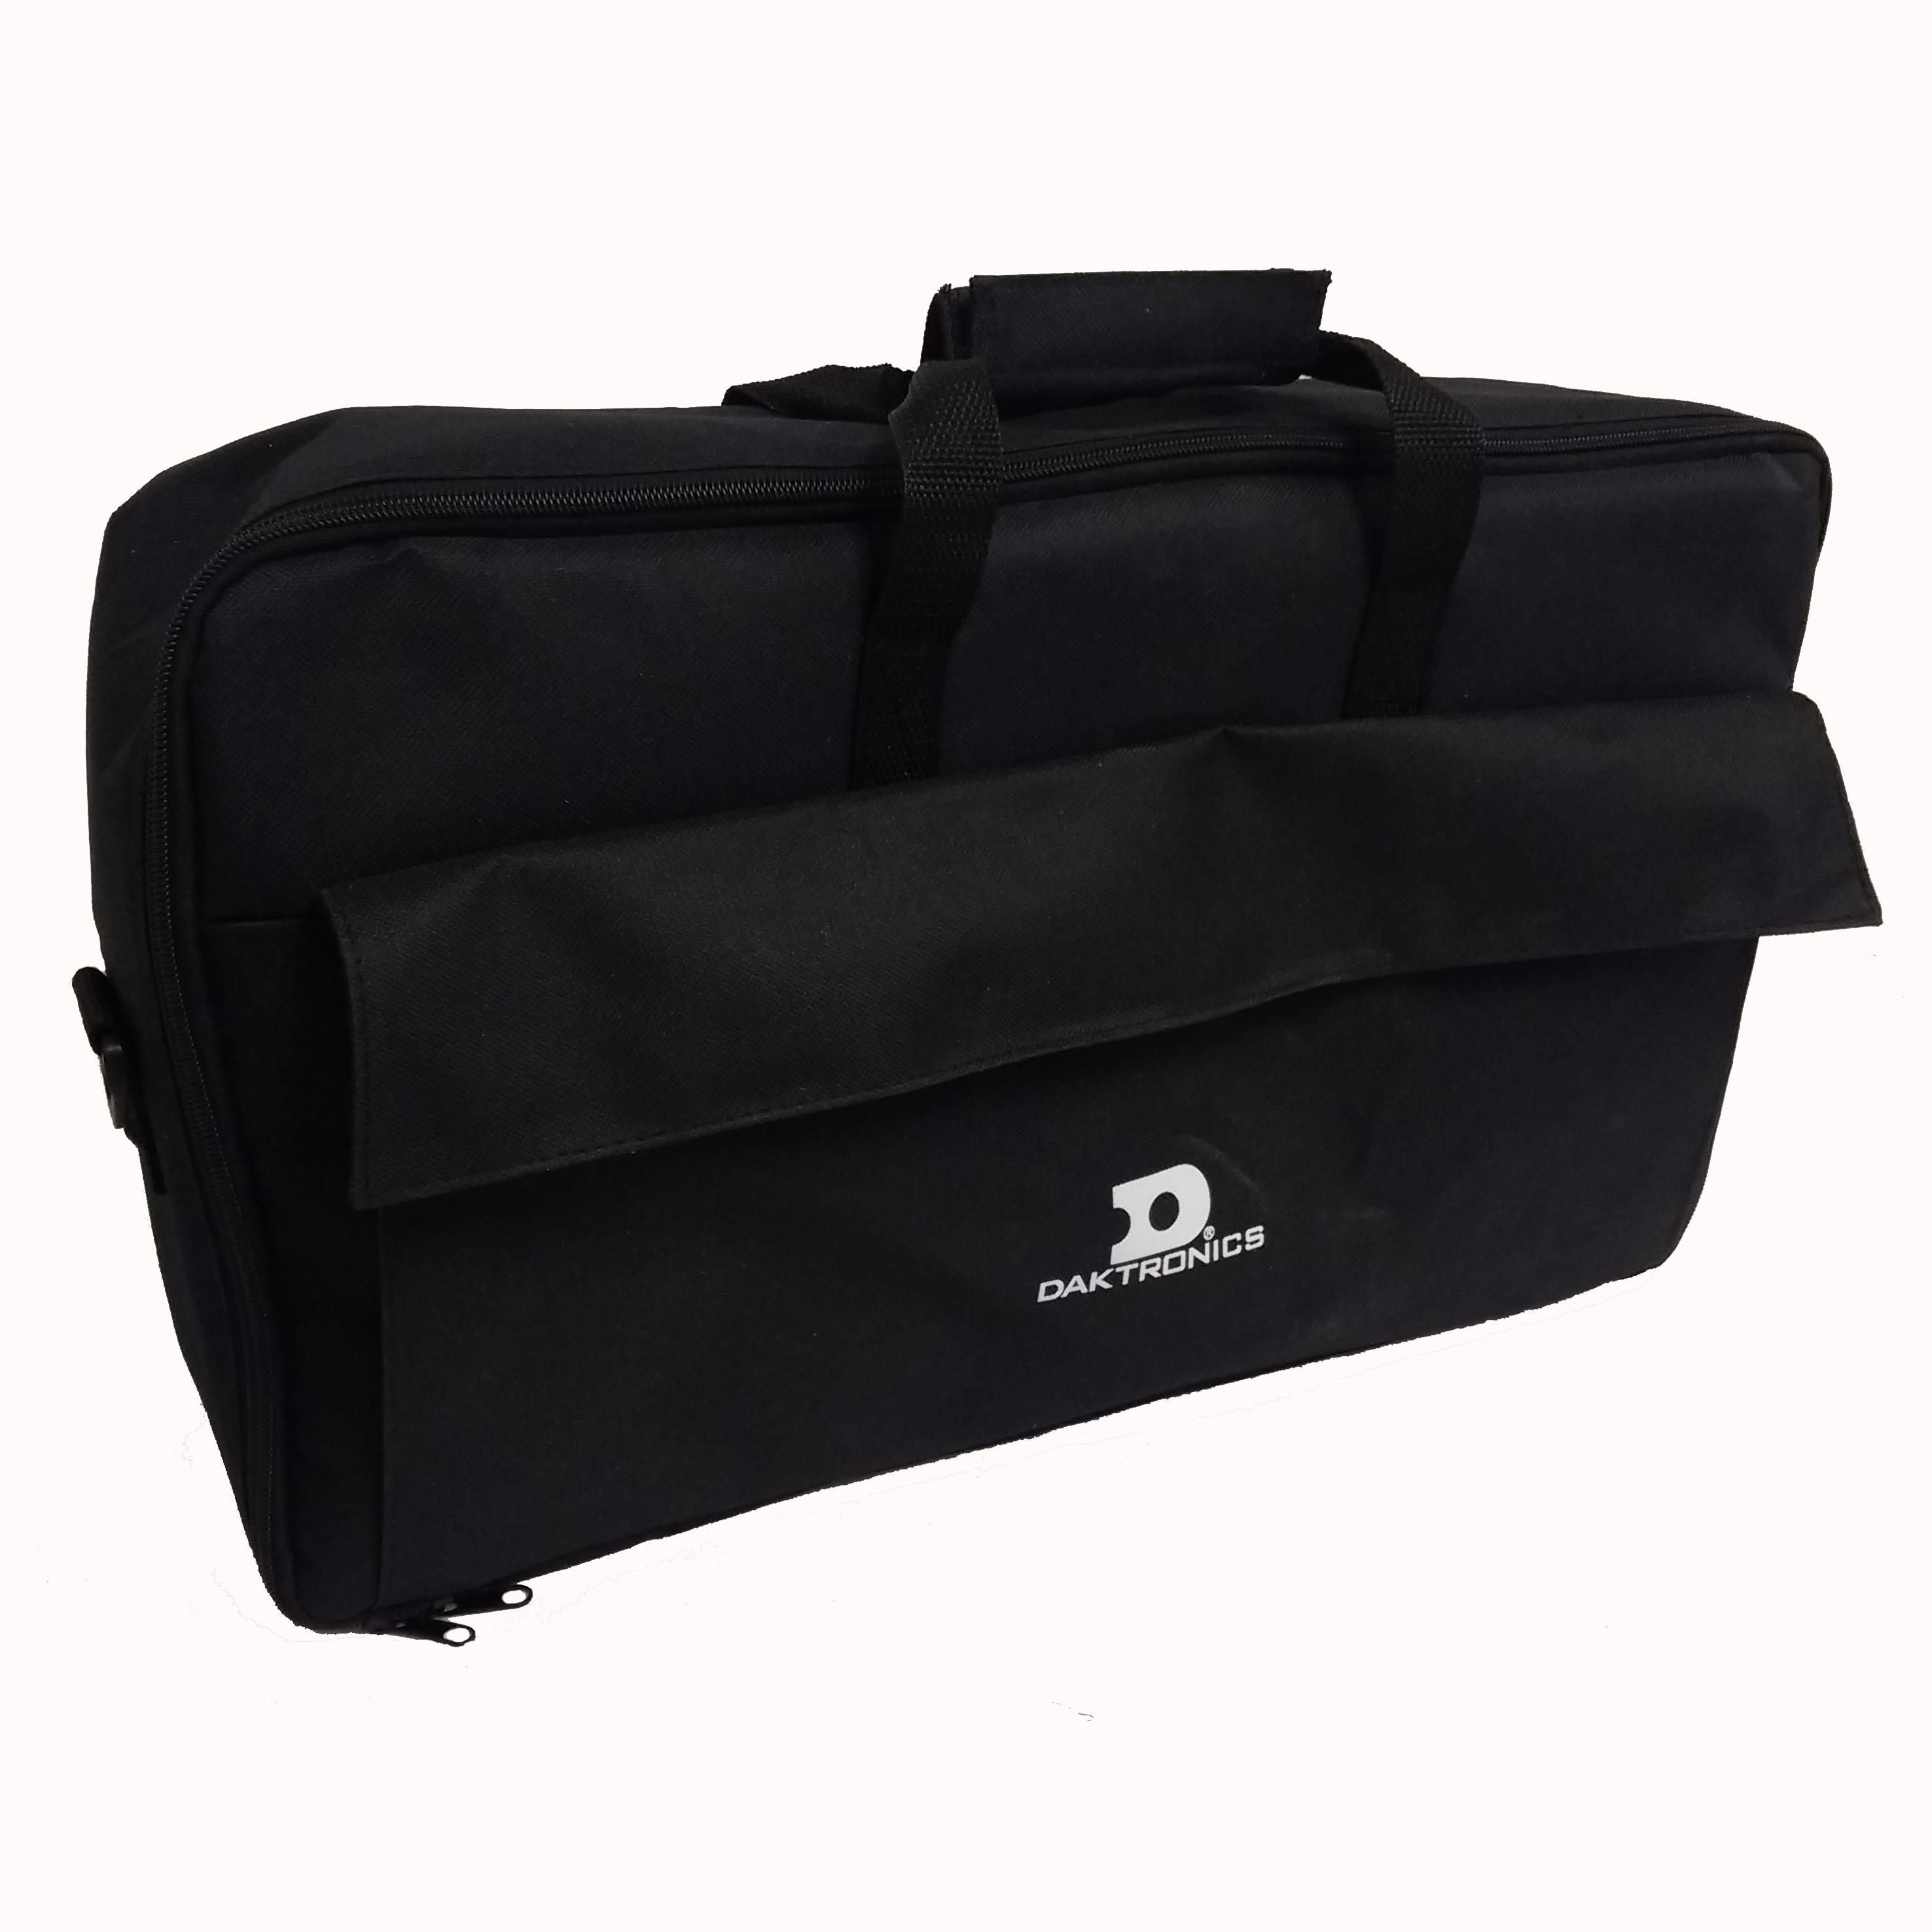 Daktronics-EN-1817-Soft-Carrying-Case-Front